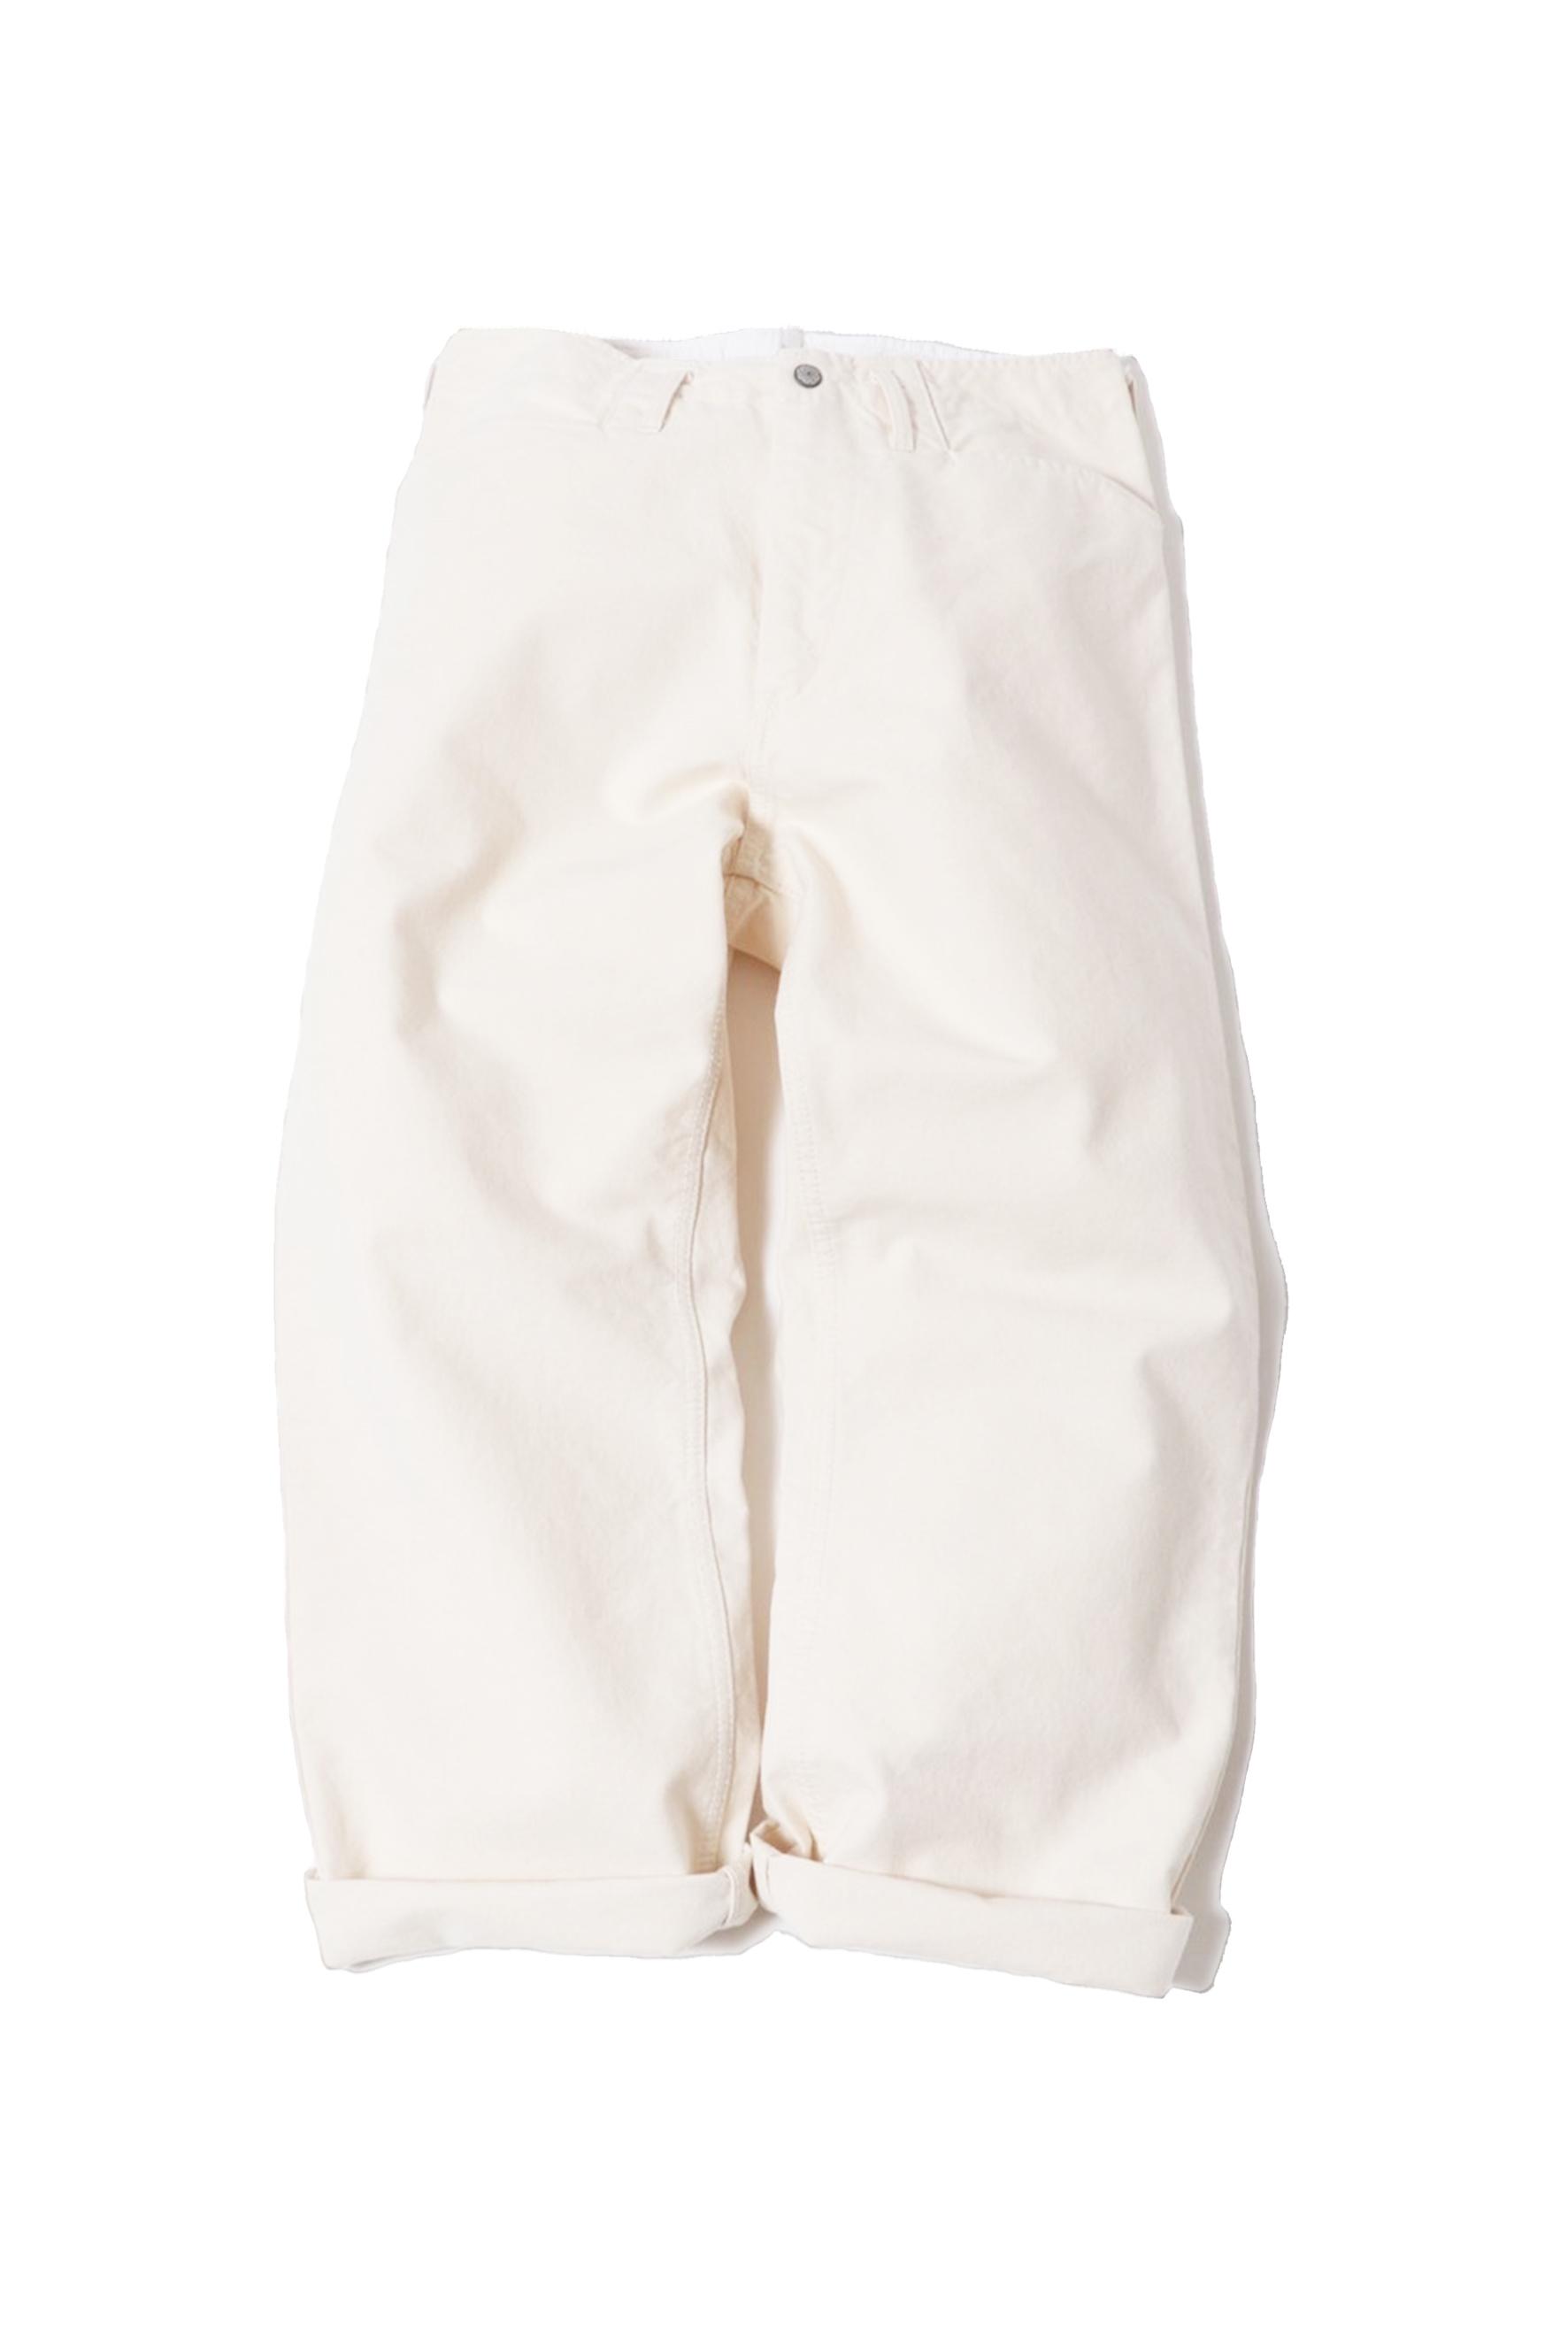 13.5oz Canvas Frisco Pants / one wash / natural